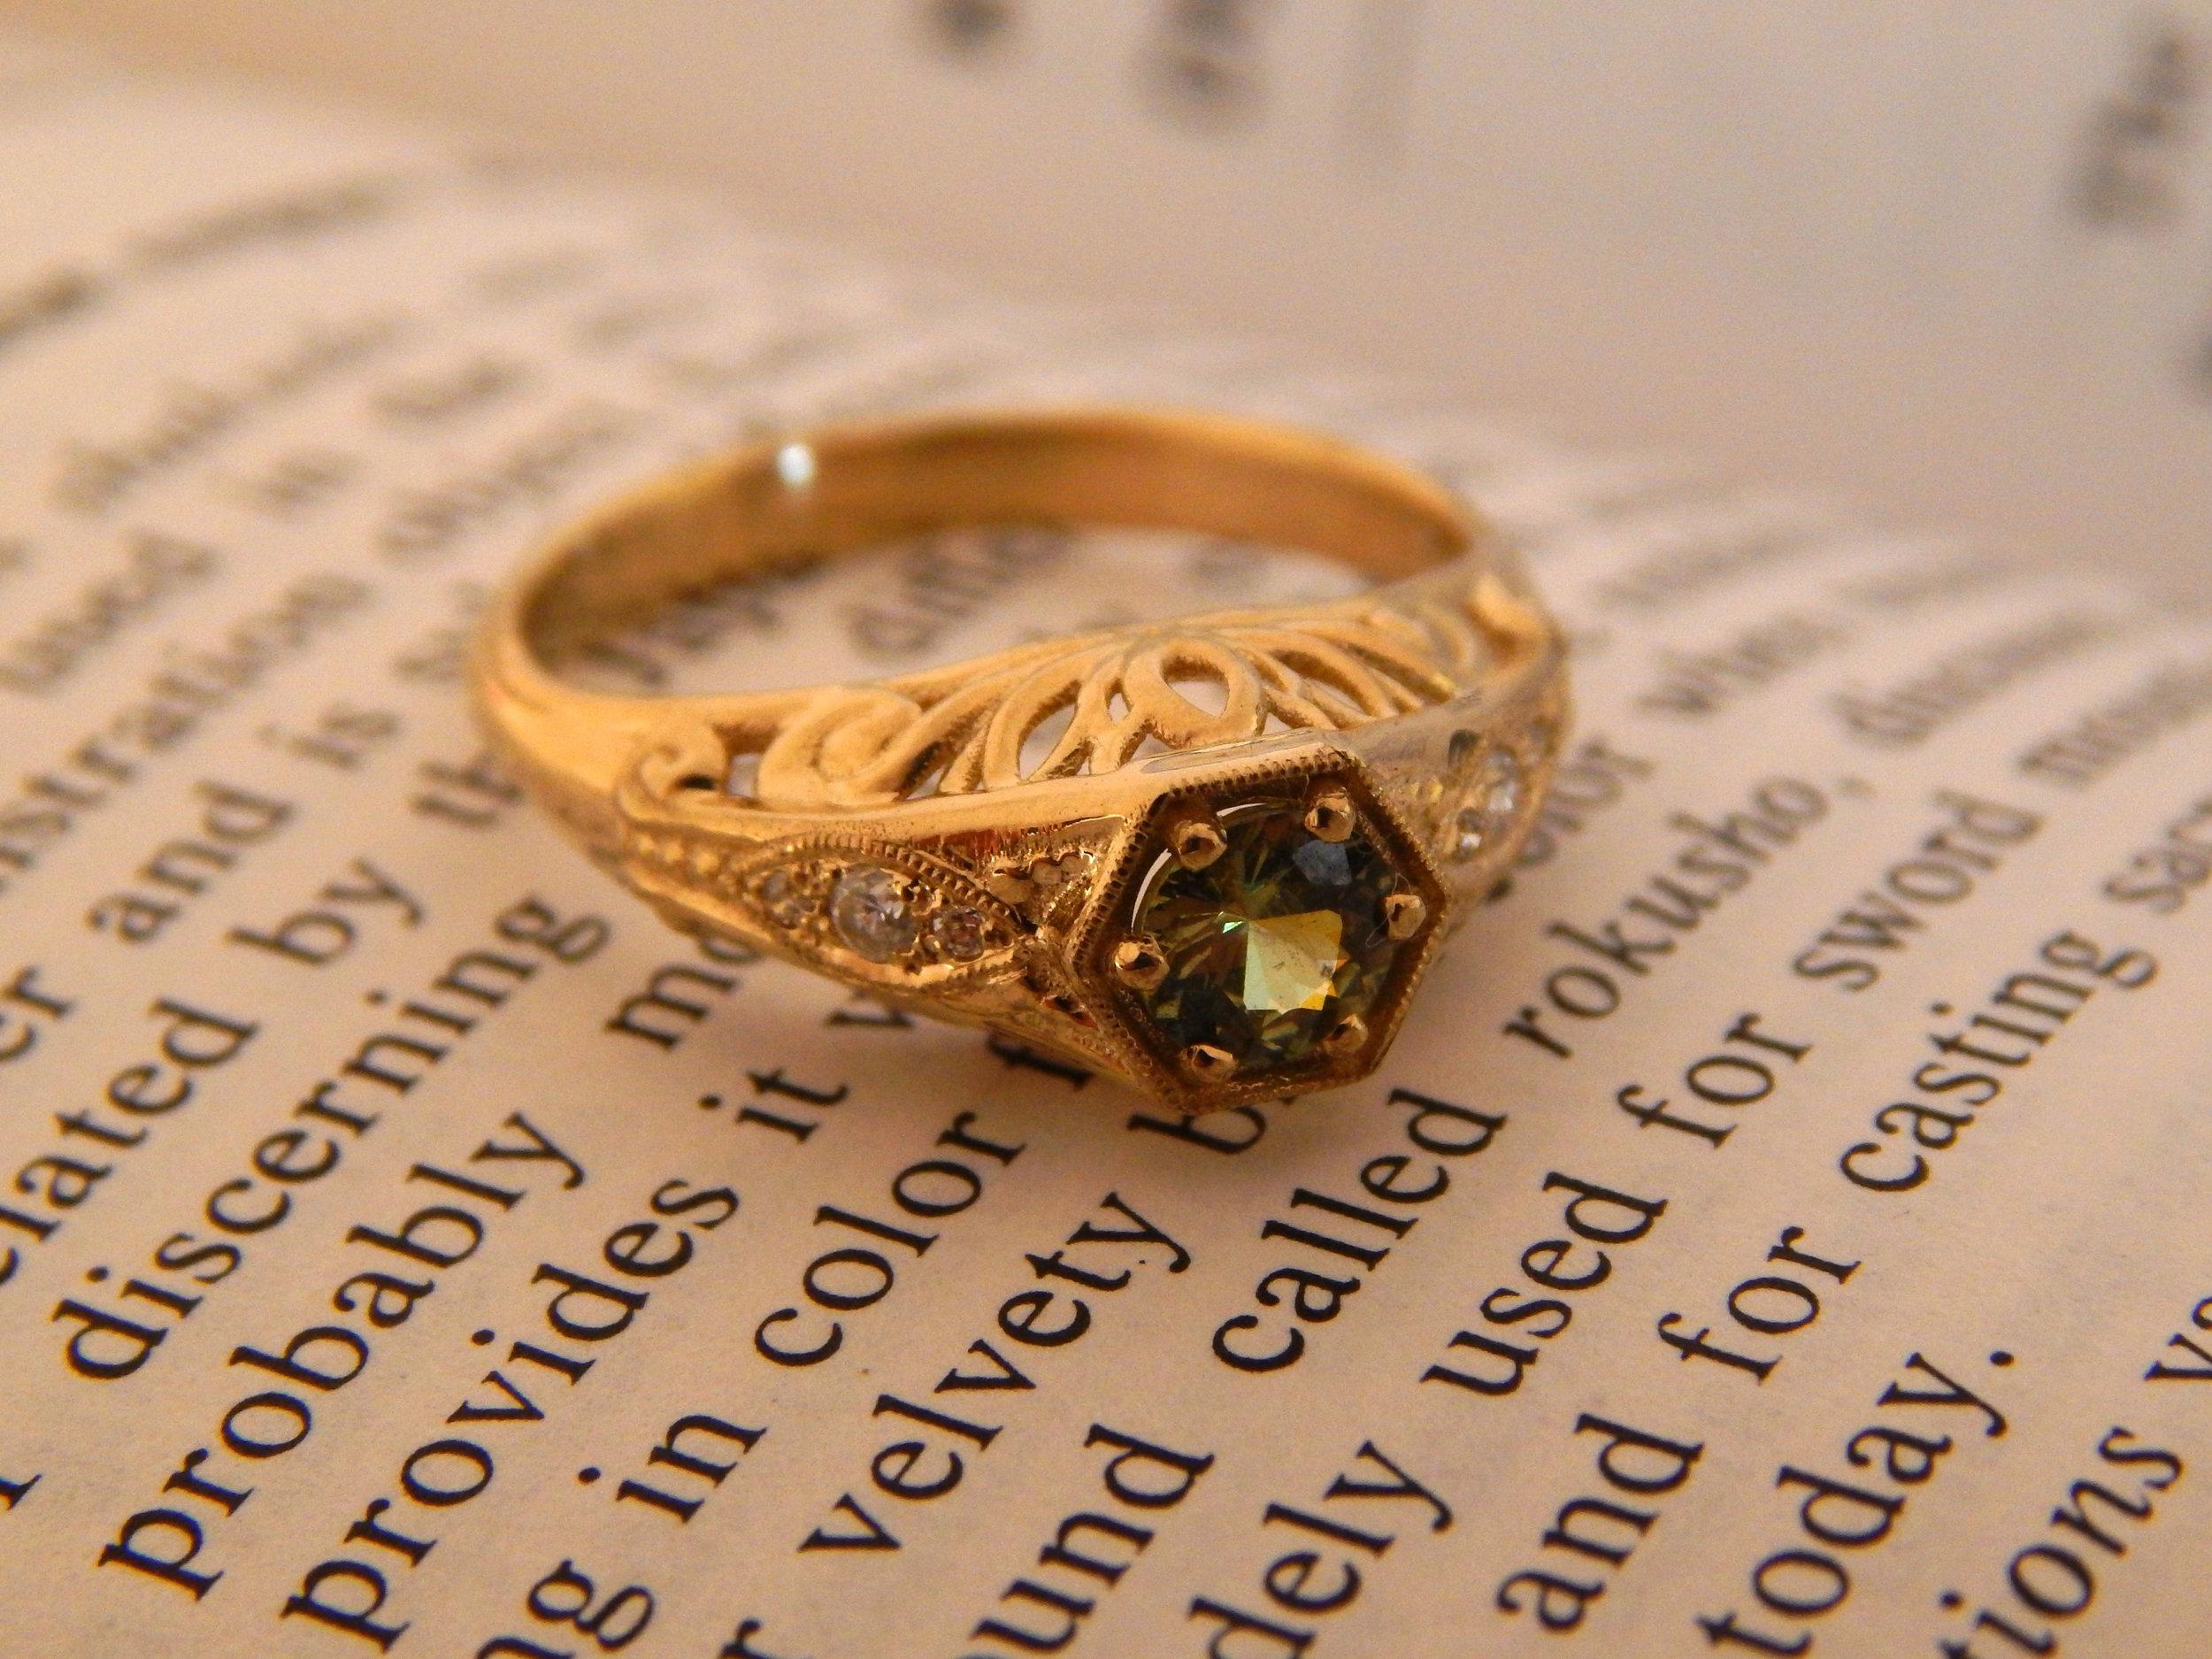 darvier-demontoid-garnet-vintage-inspired-ring.JPG